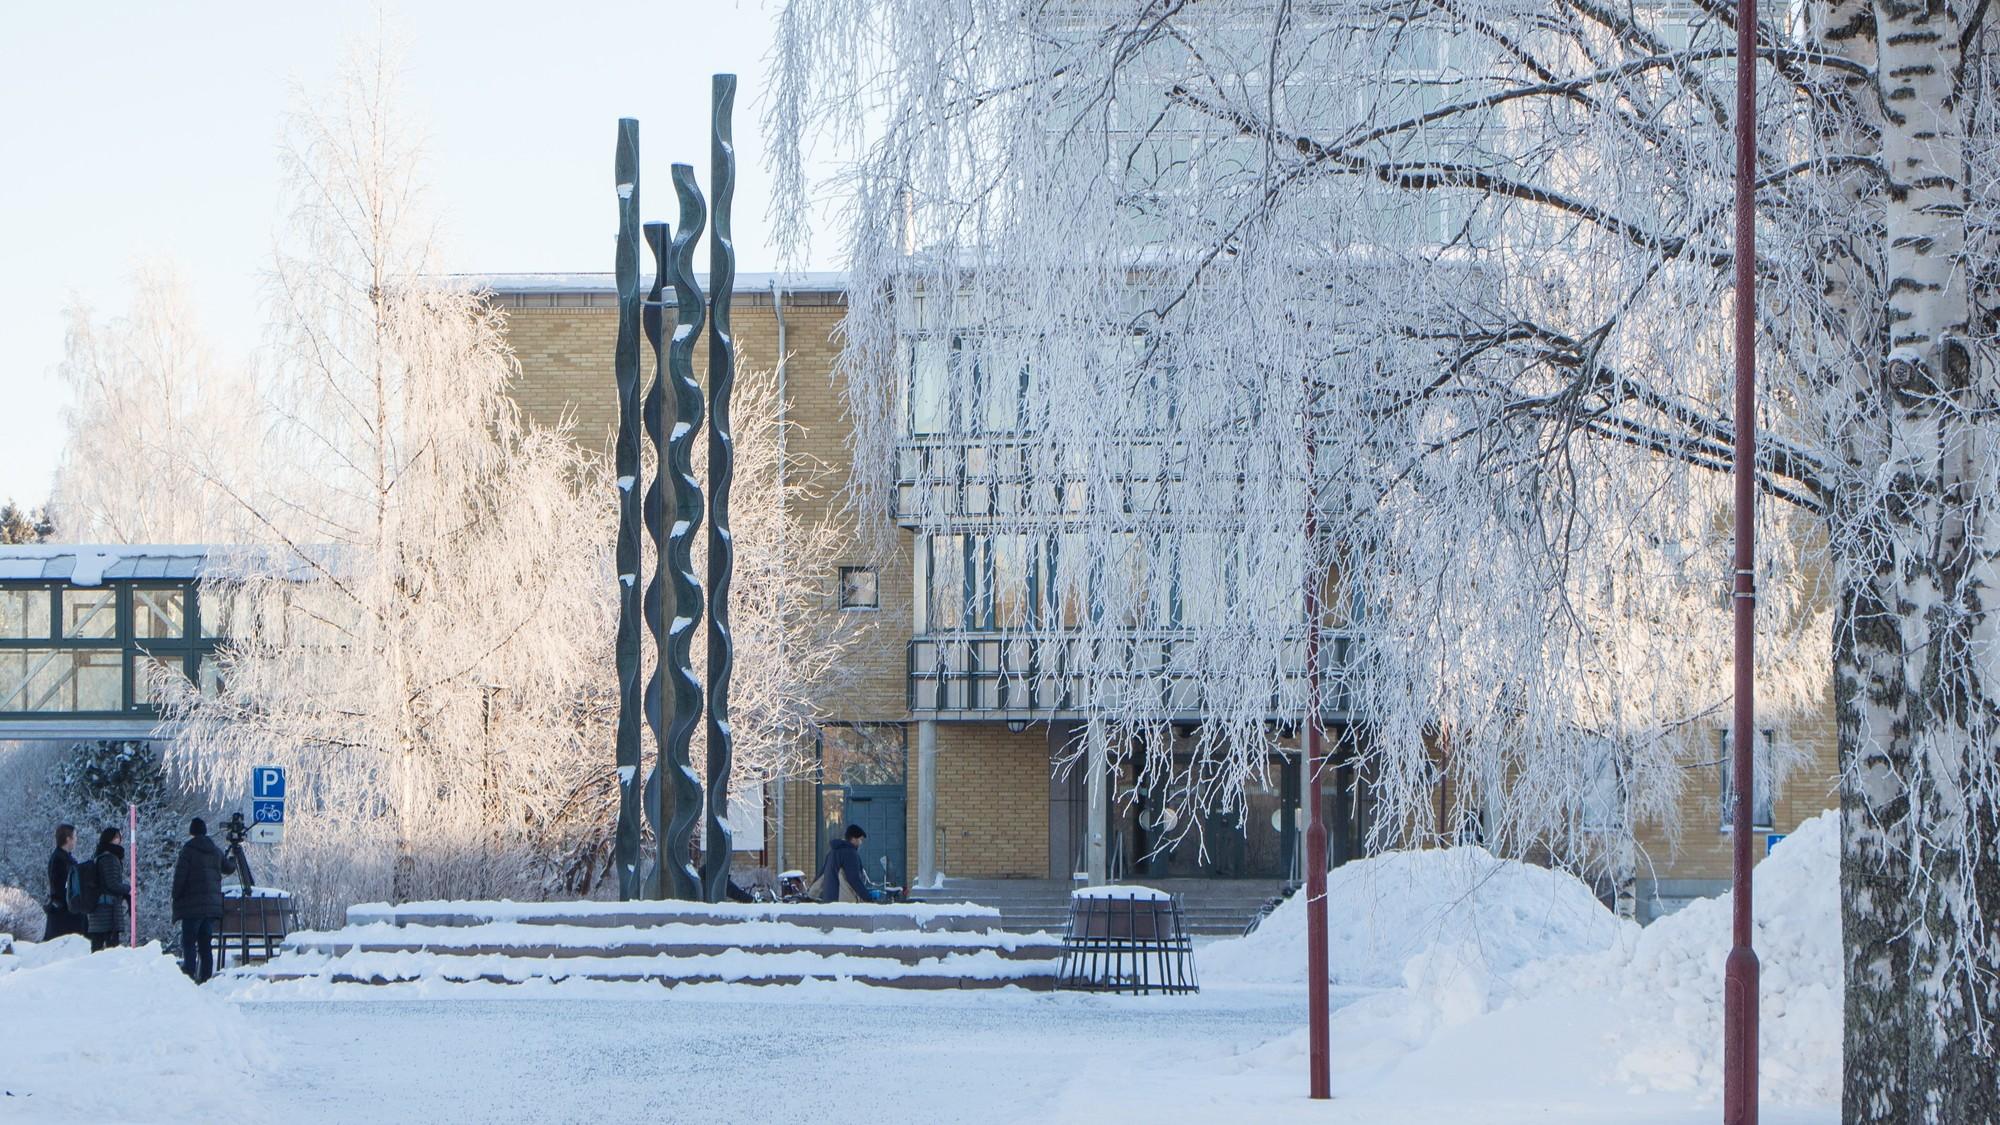 campus_vinter_IMG_1039_160125_UBK16 8.jpg